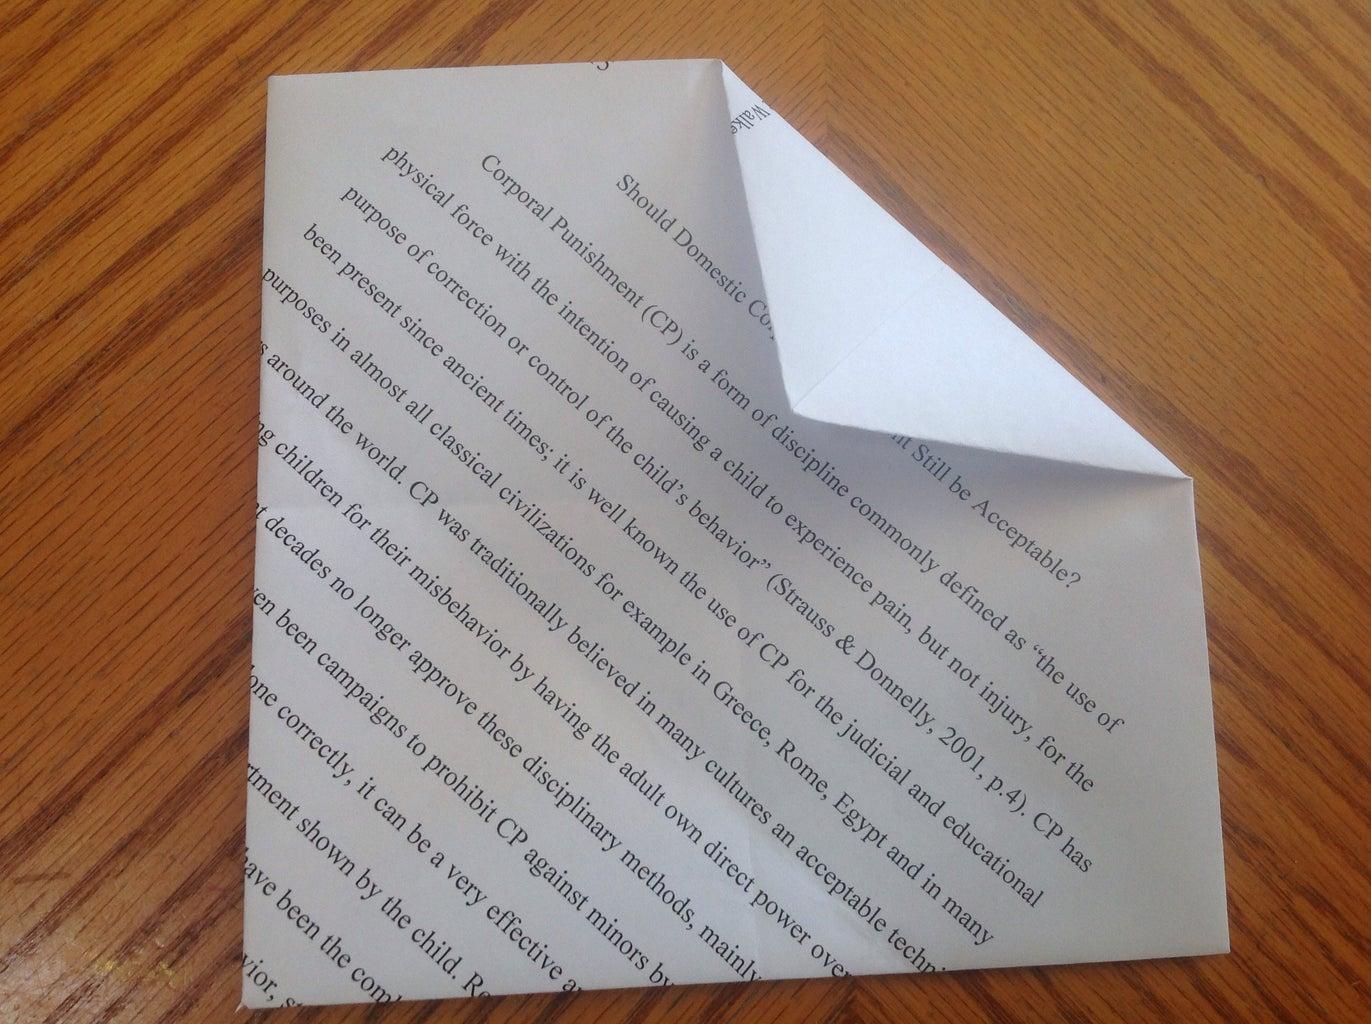 Part 2: Fold